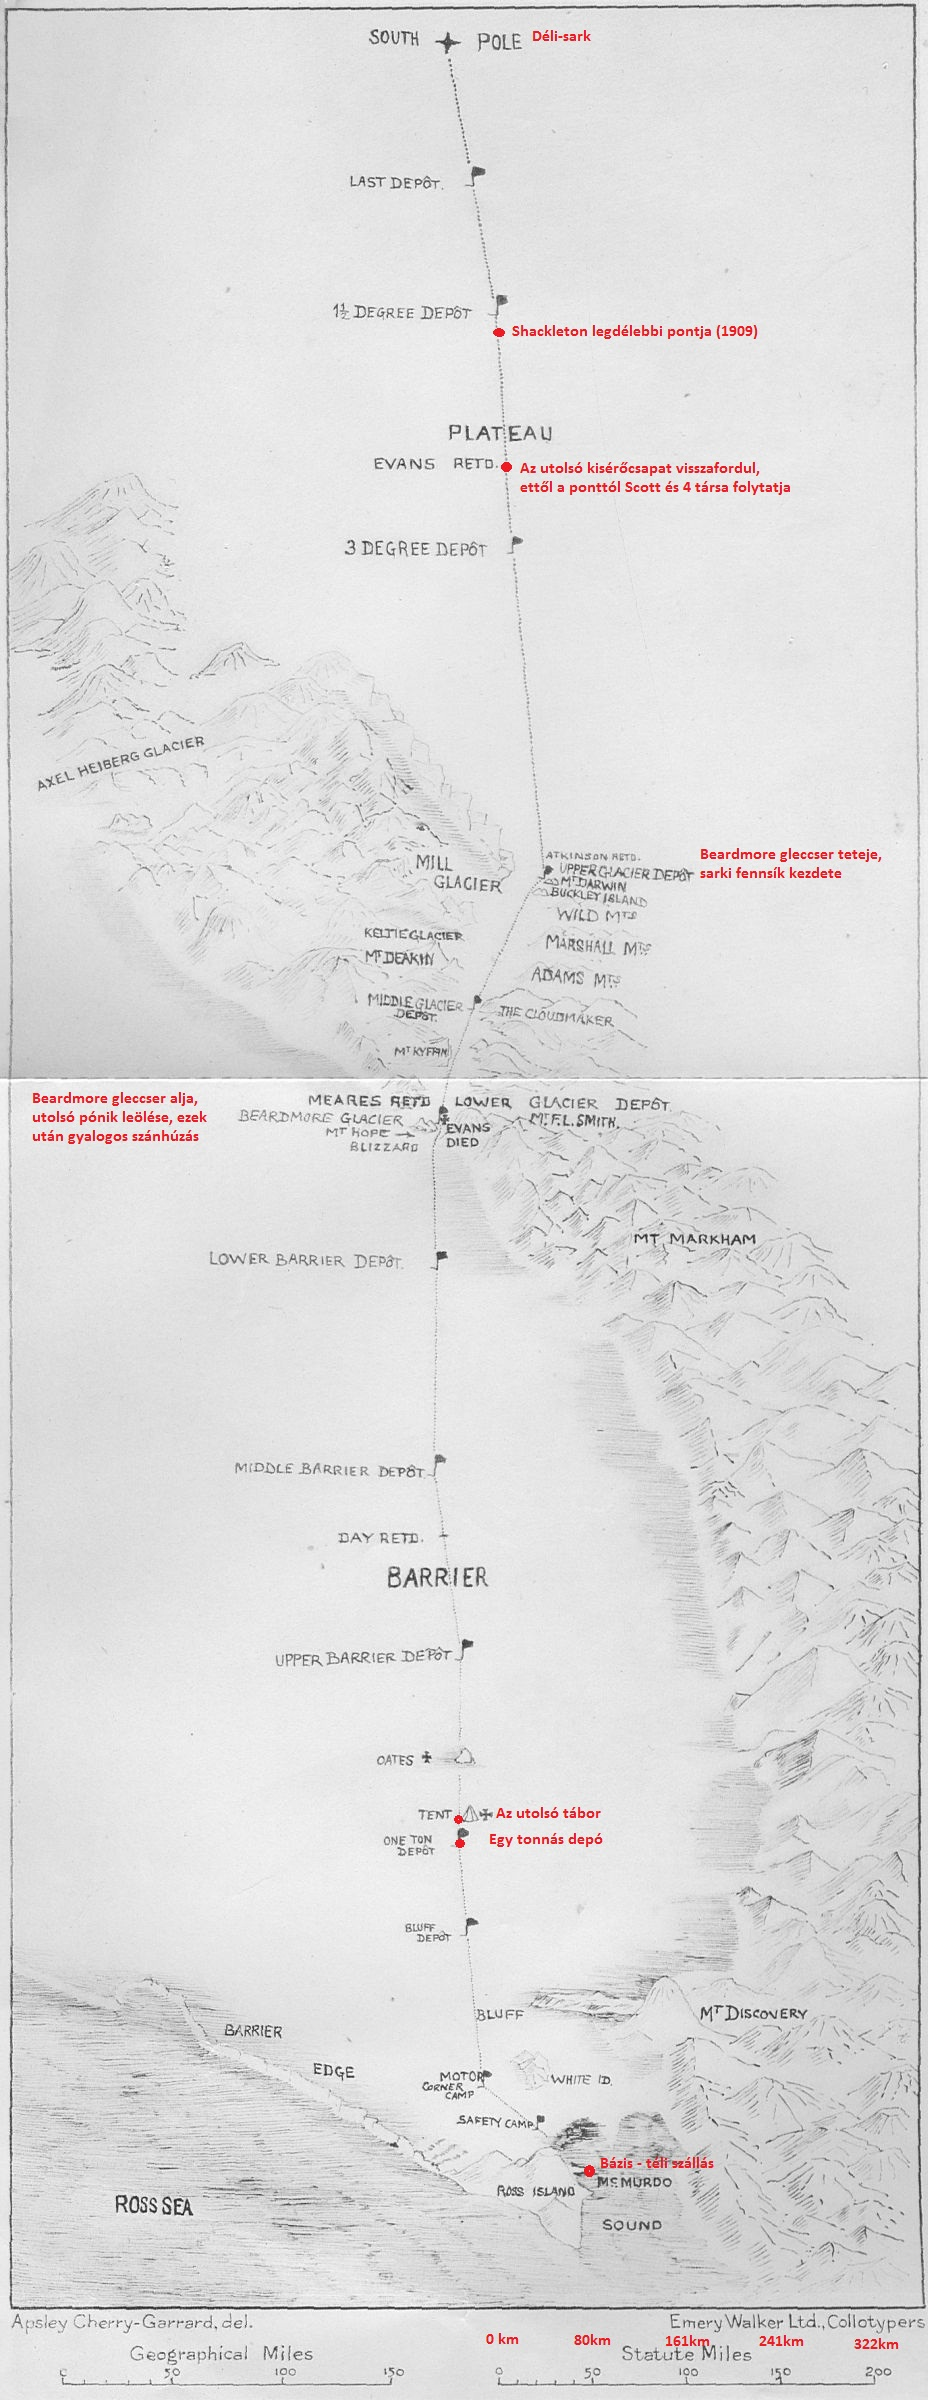 Terra_Nova_Expedition_route_1.jpg